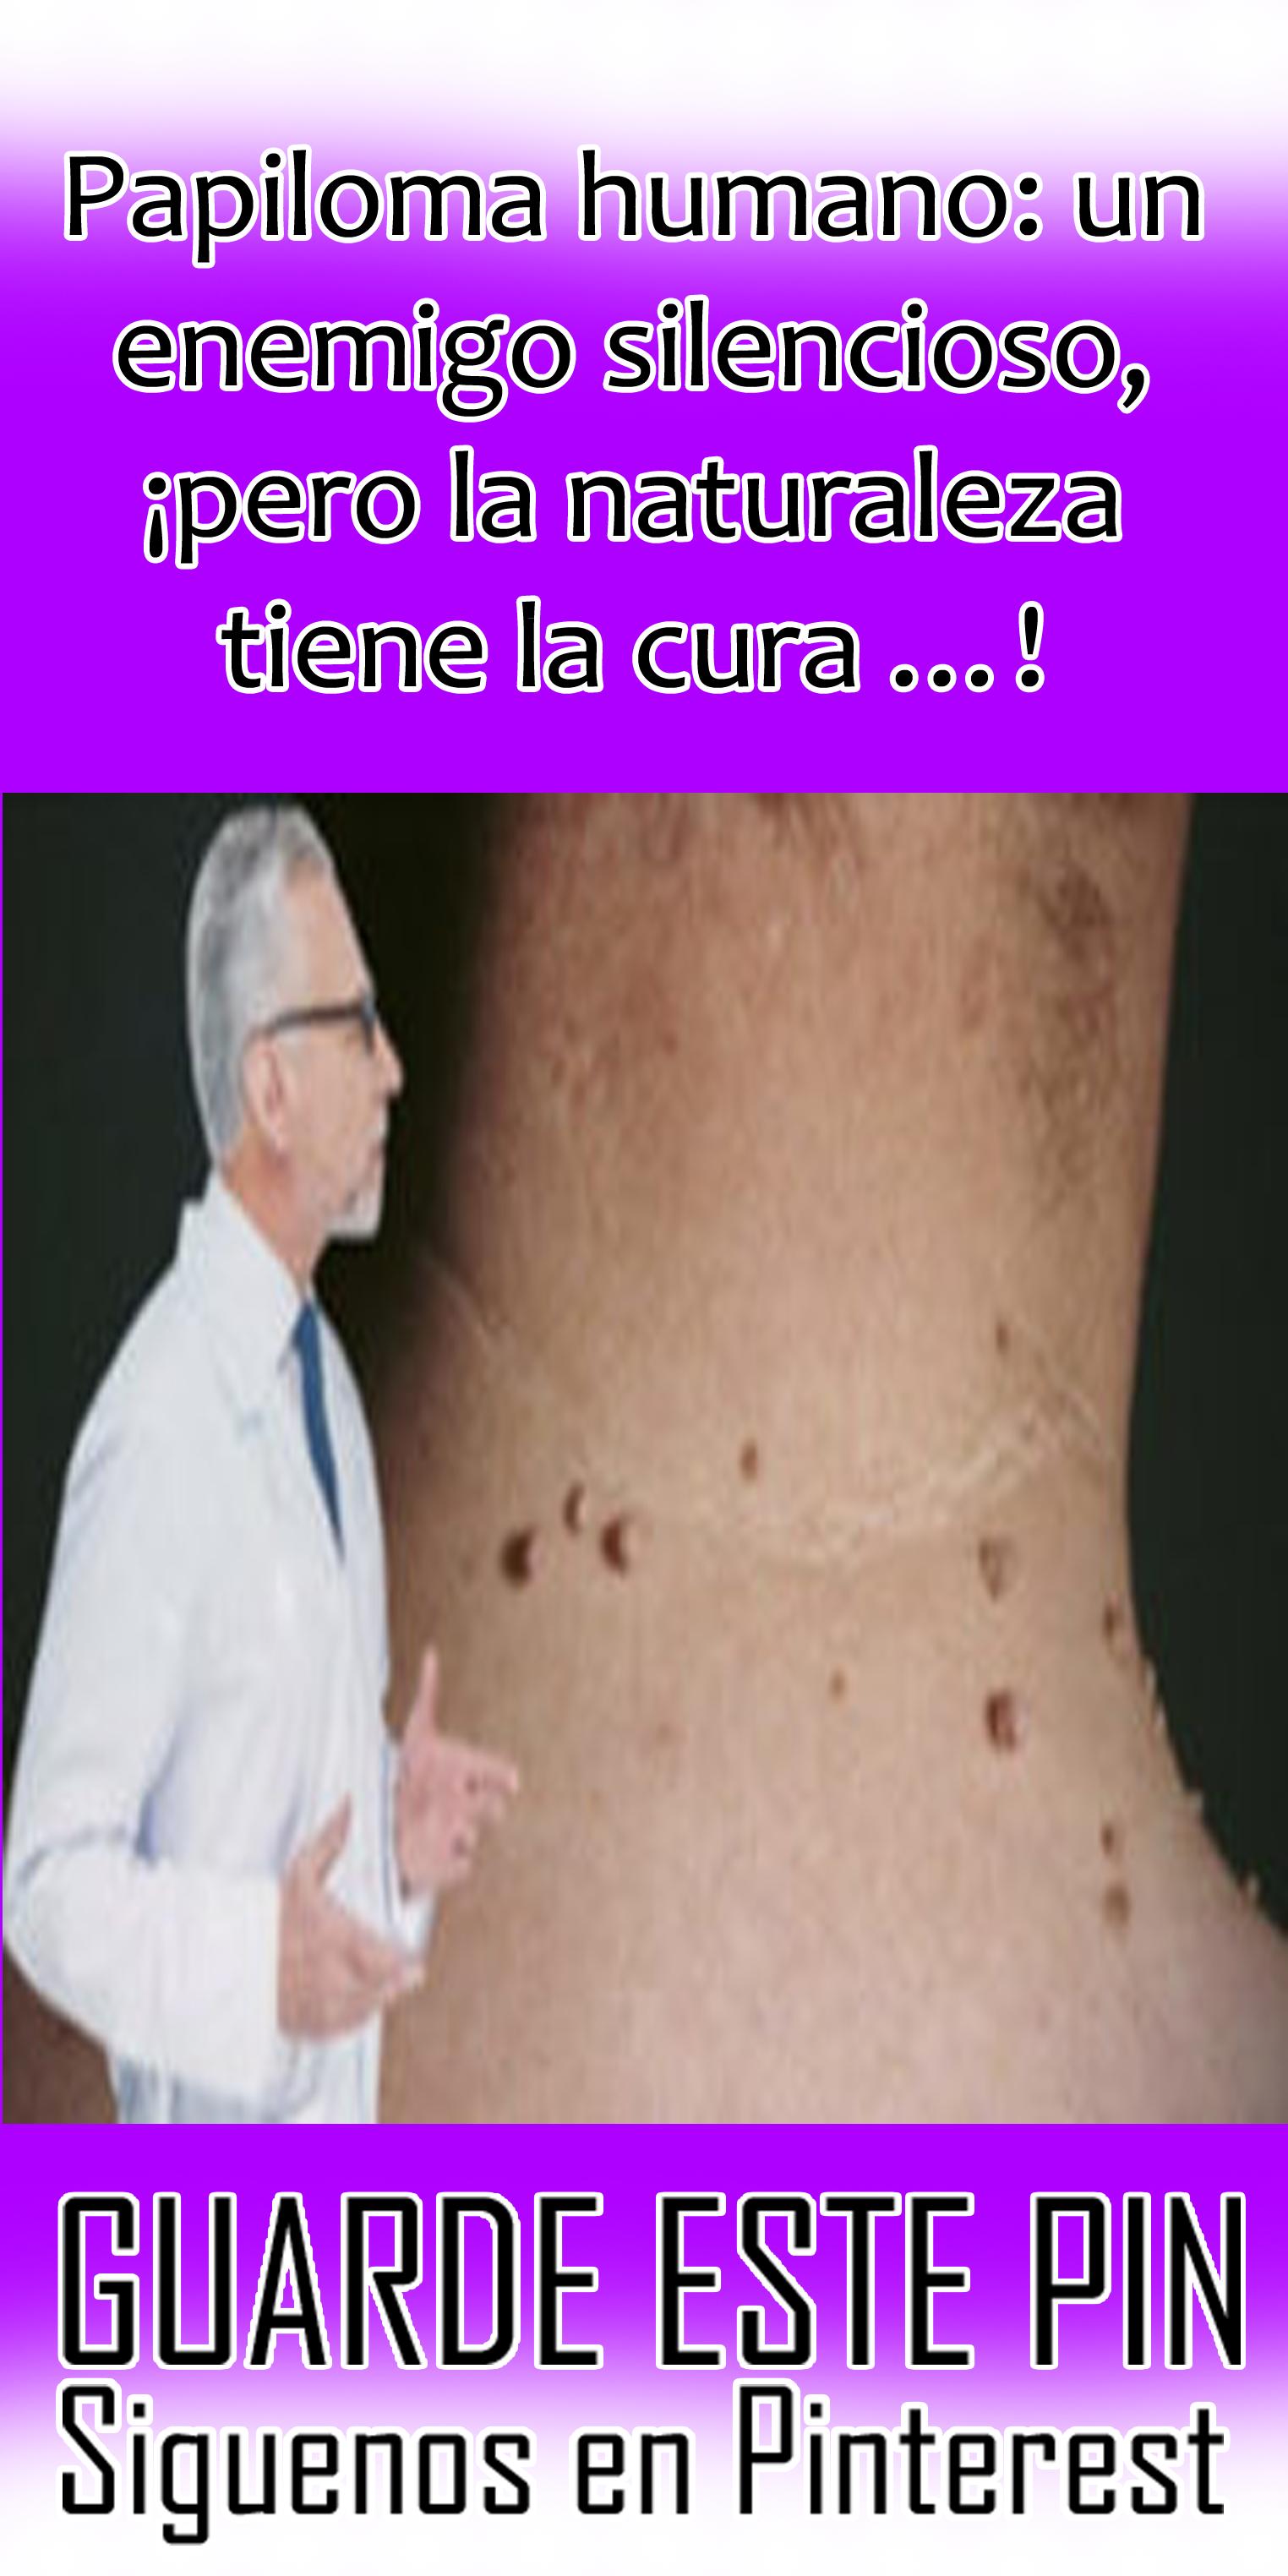 virus papiloma humano mujeres cura